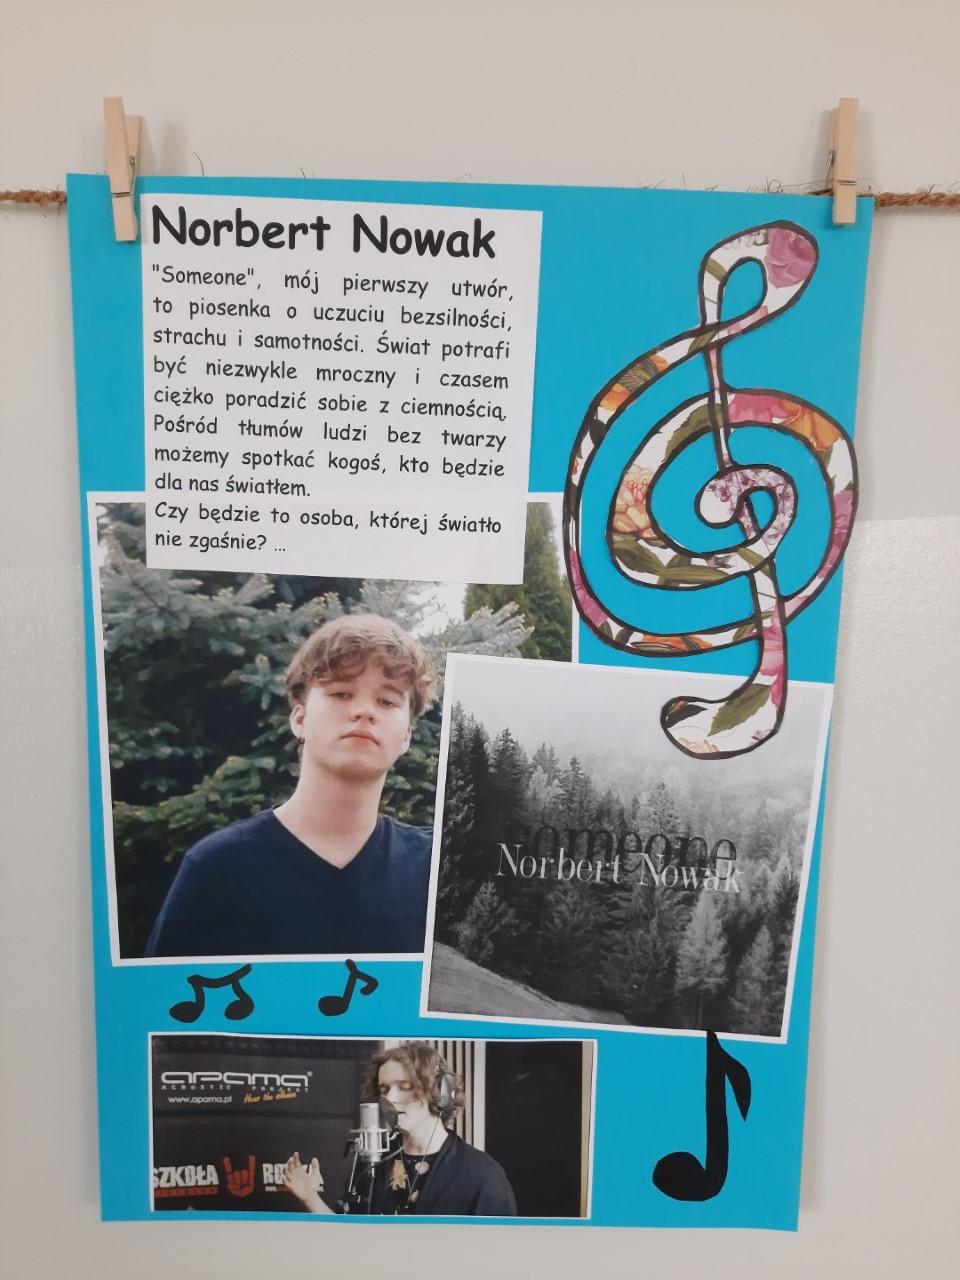 Norbert-Nowak